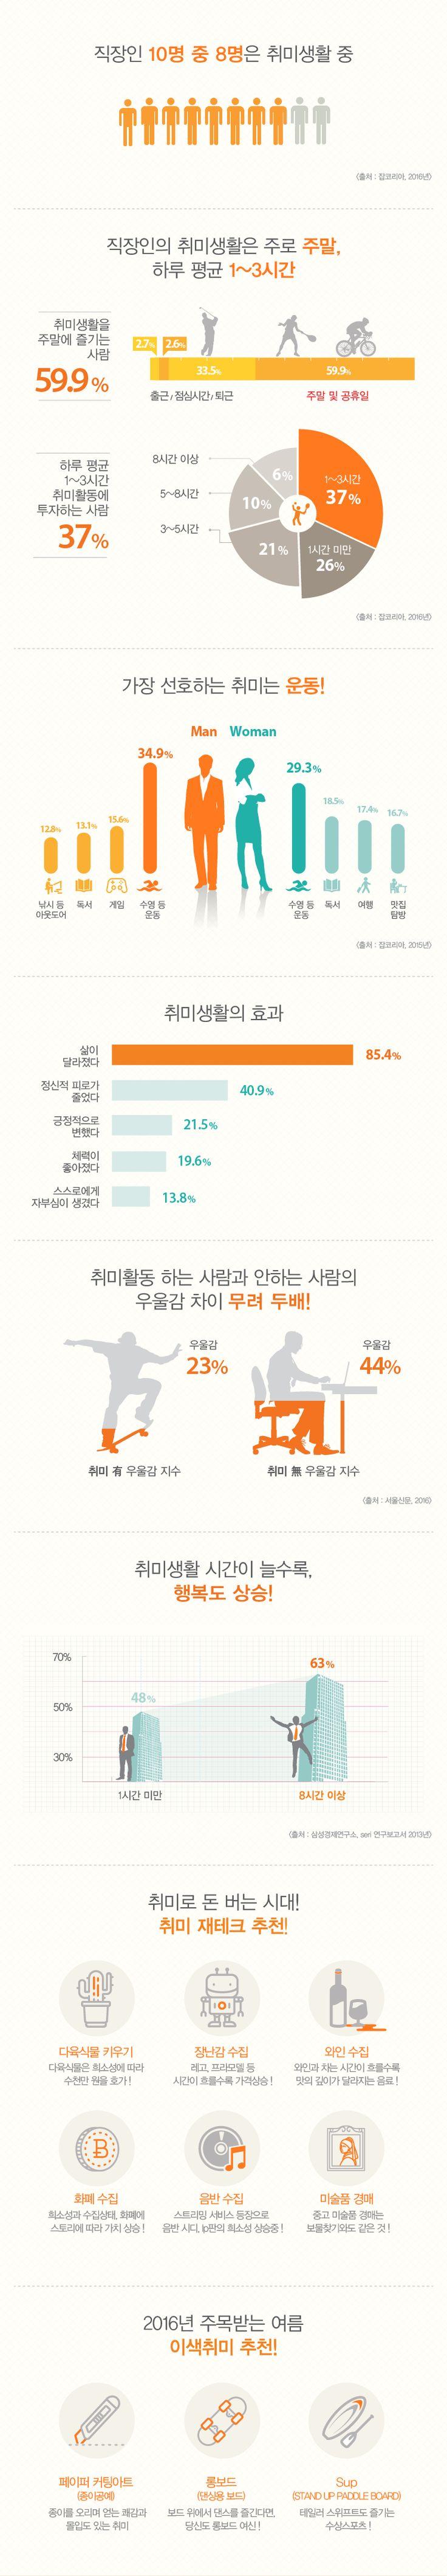 [Infographic] 직장인 취미와 재테크에 관한 인포그래픽